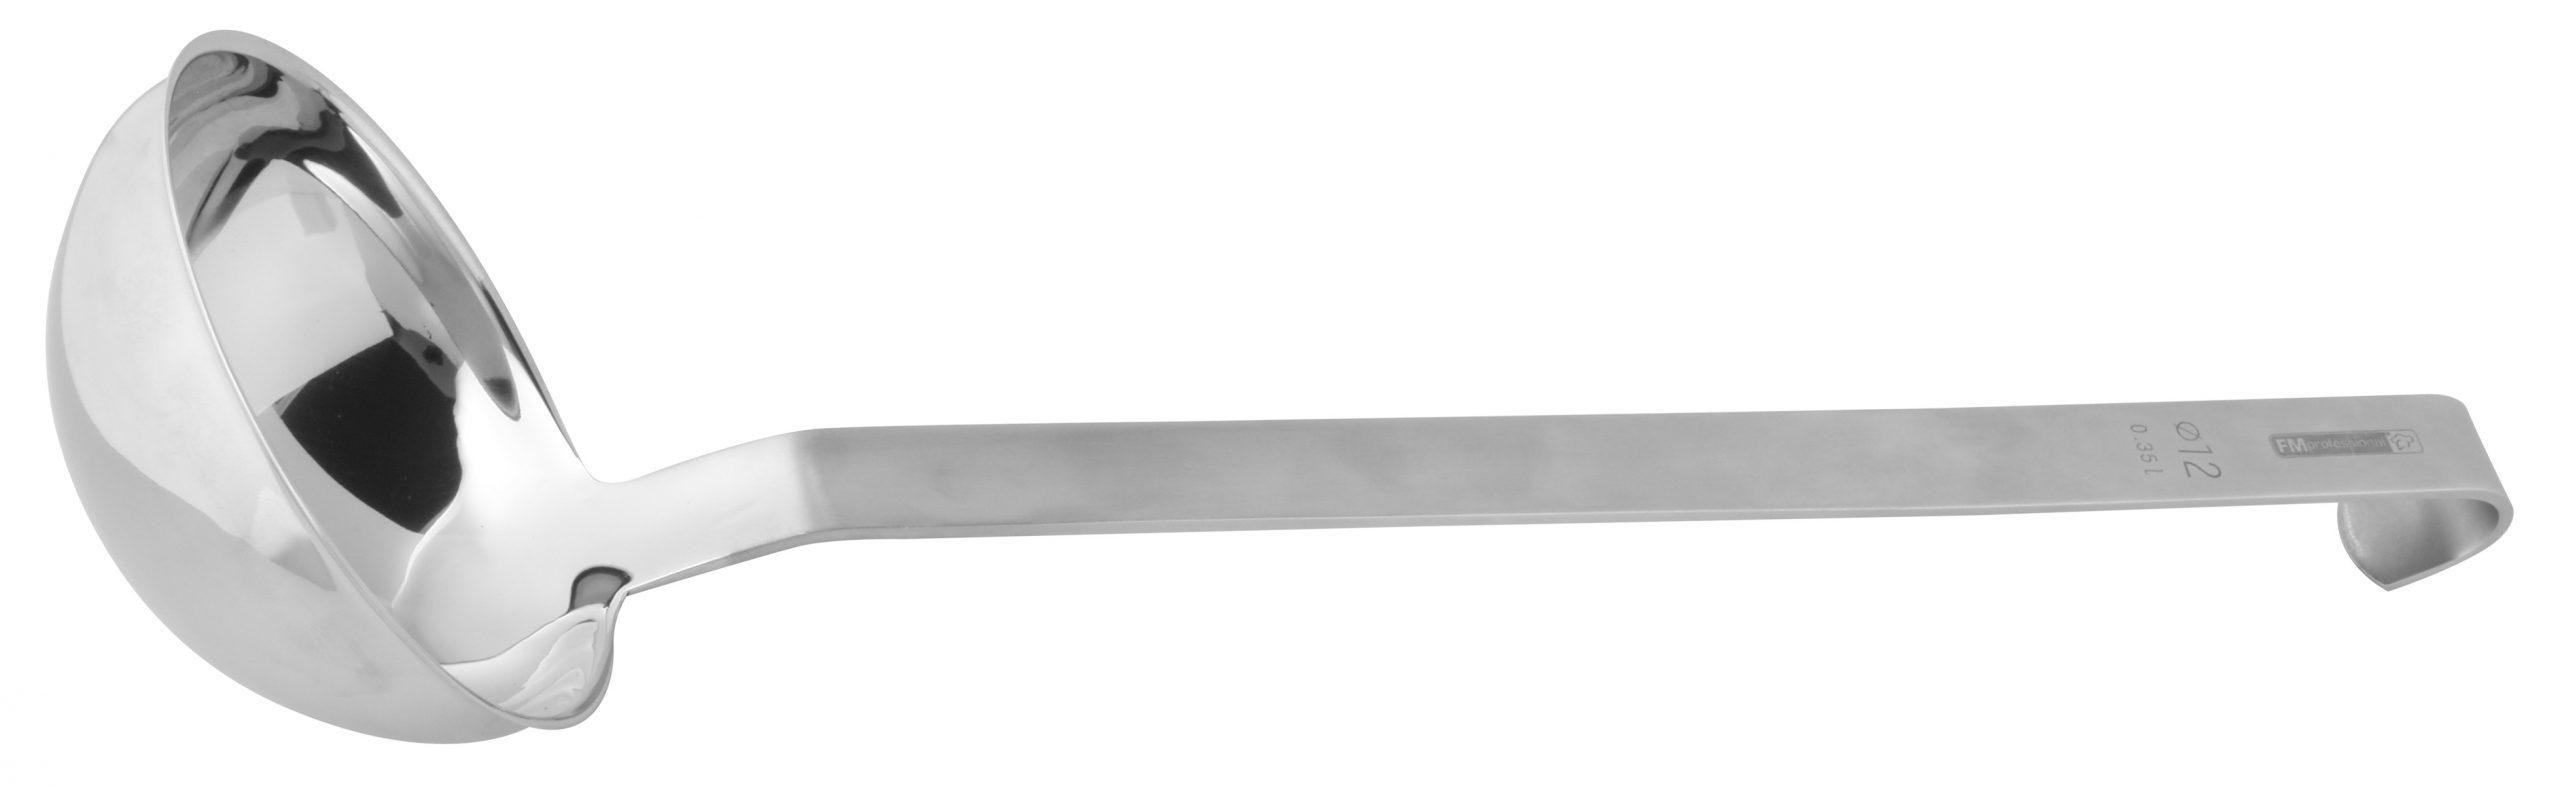 Schöpflöffel 35cl 46cm INOX